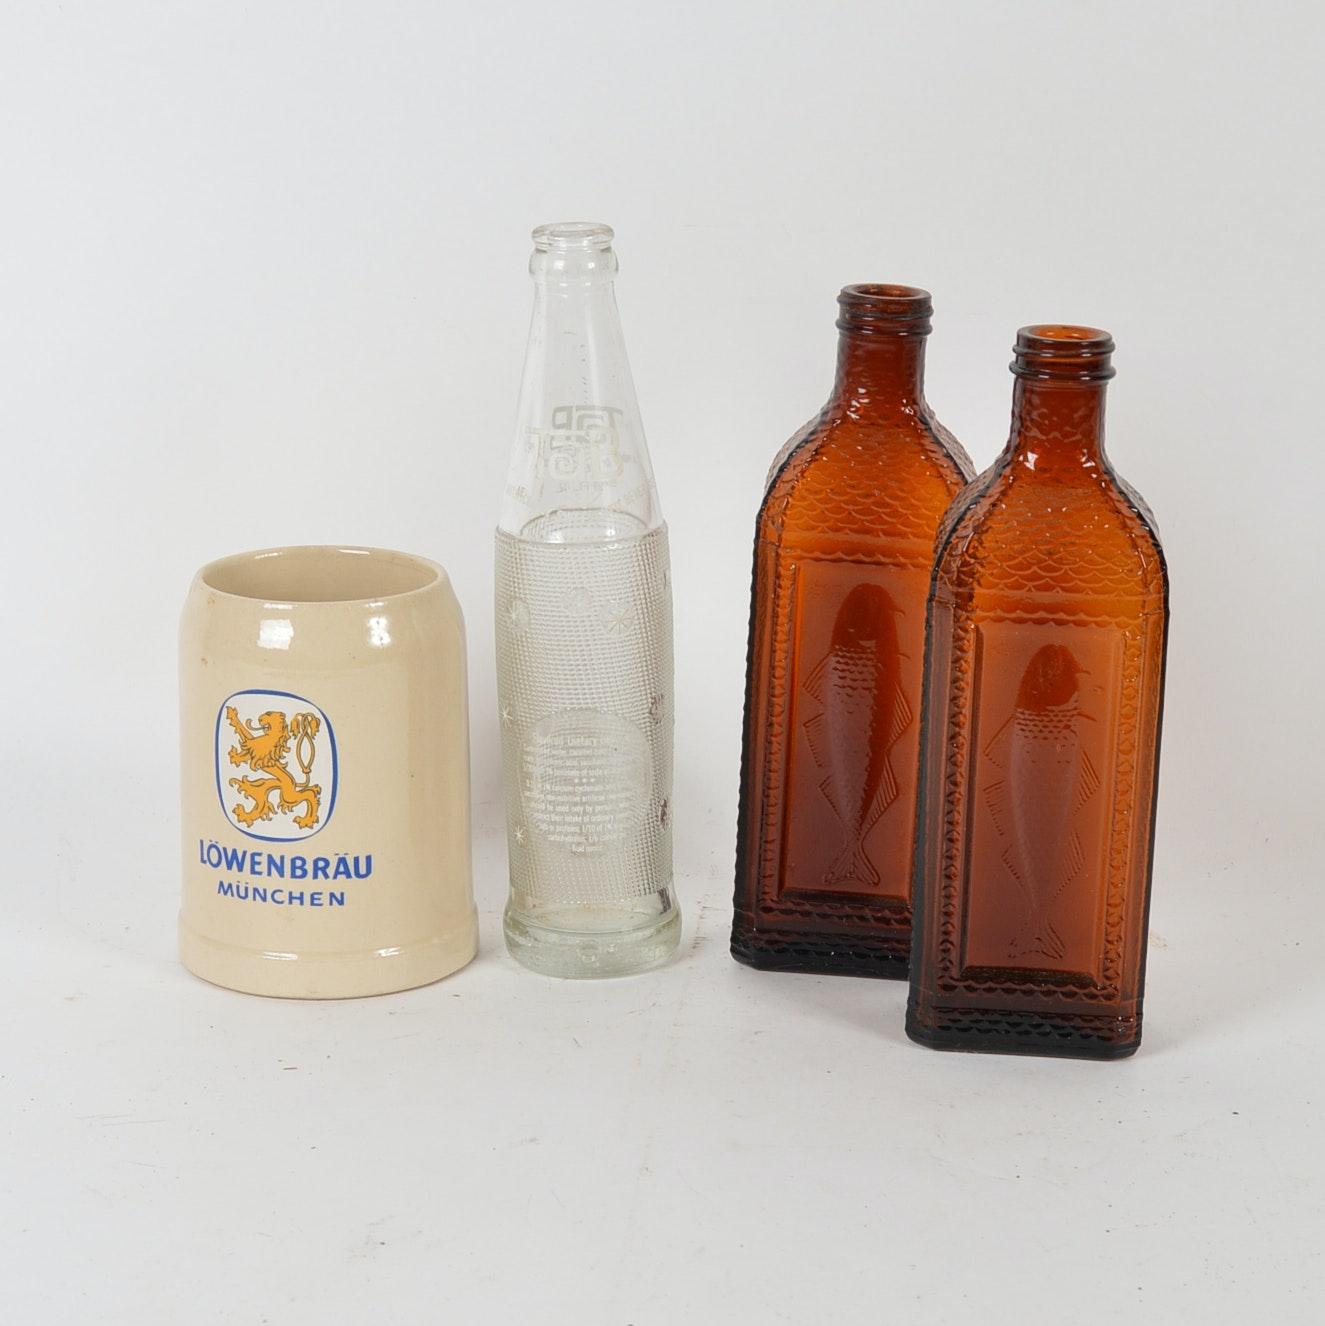 Vintage Glassware and Beer Stein Mug